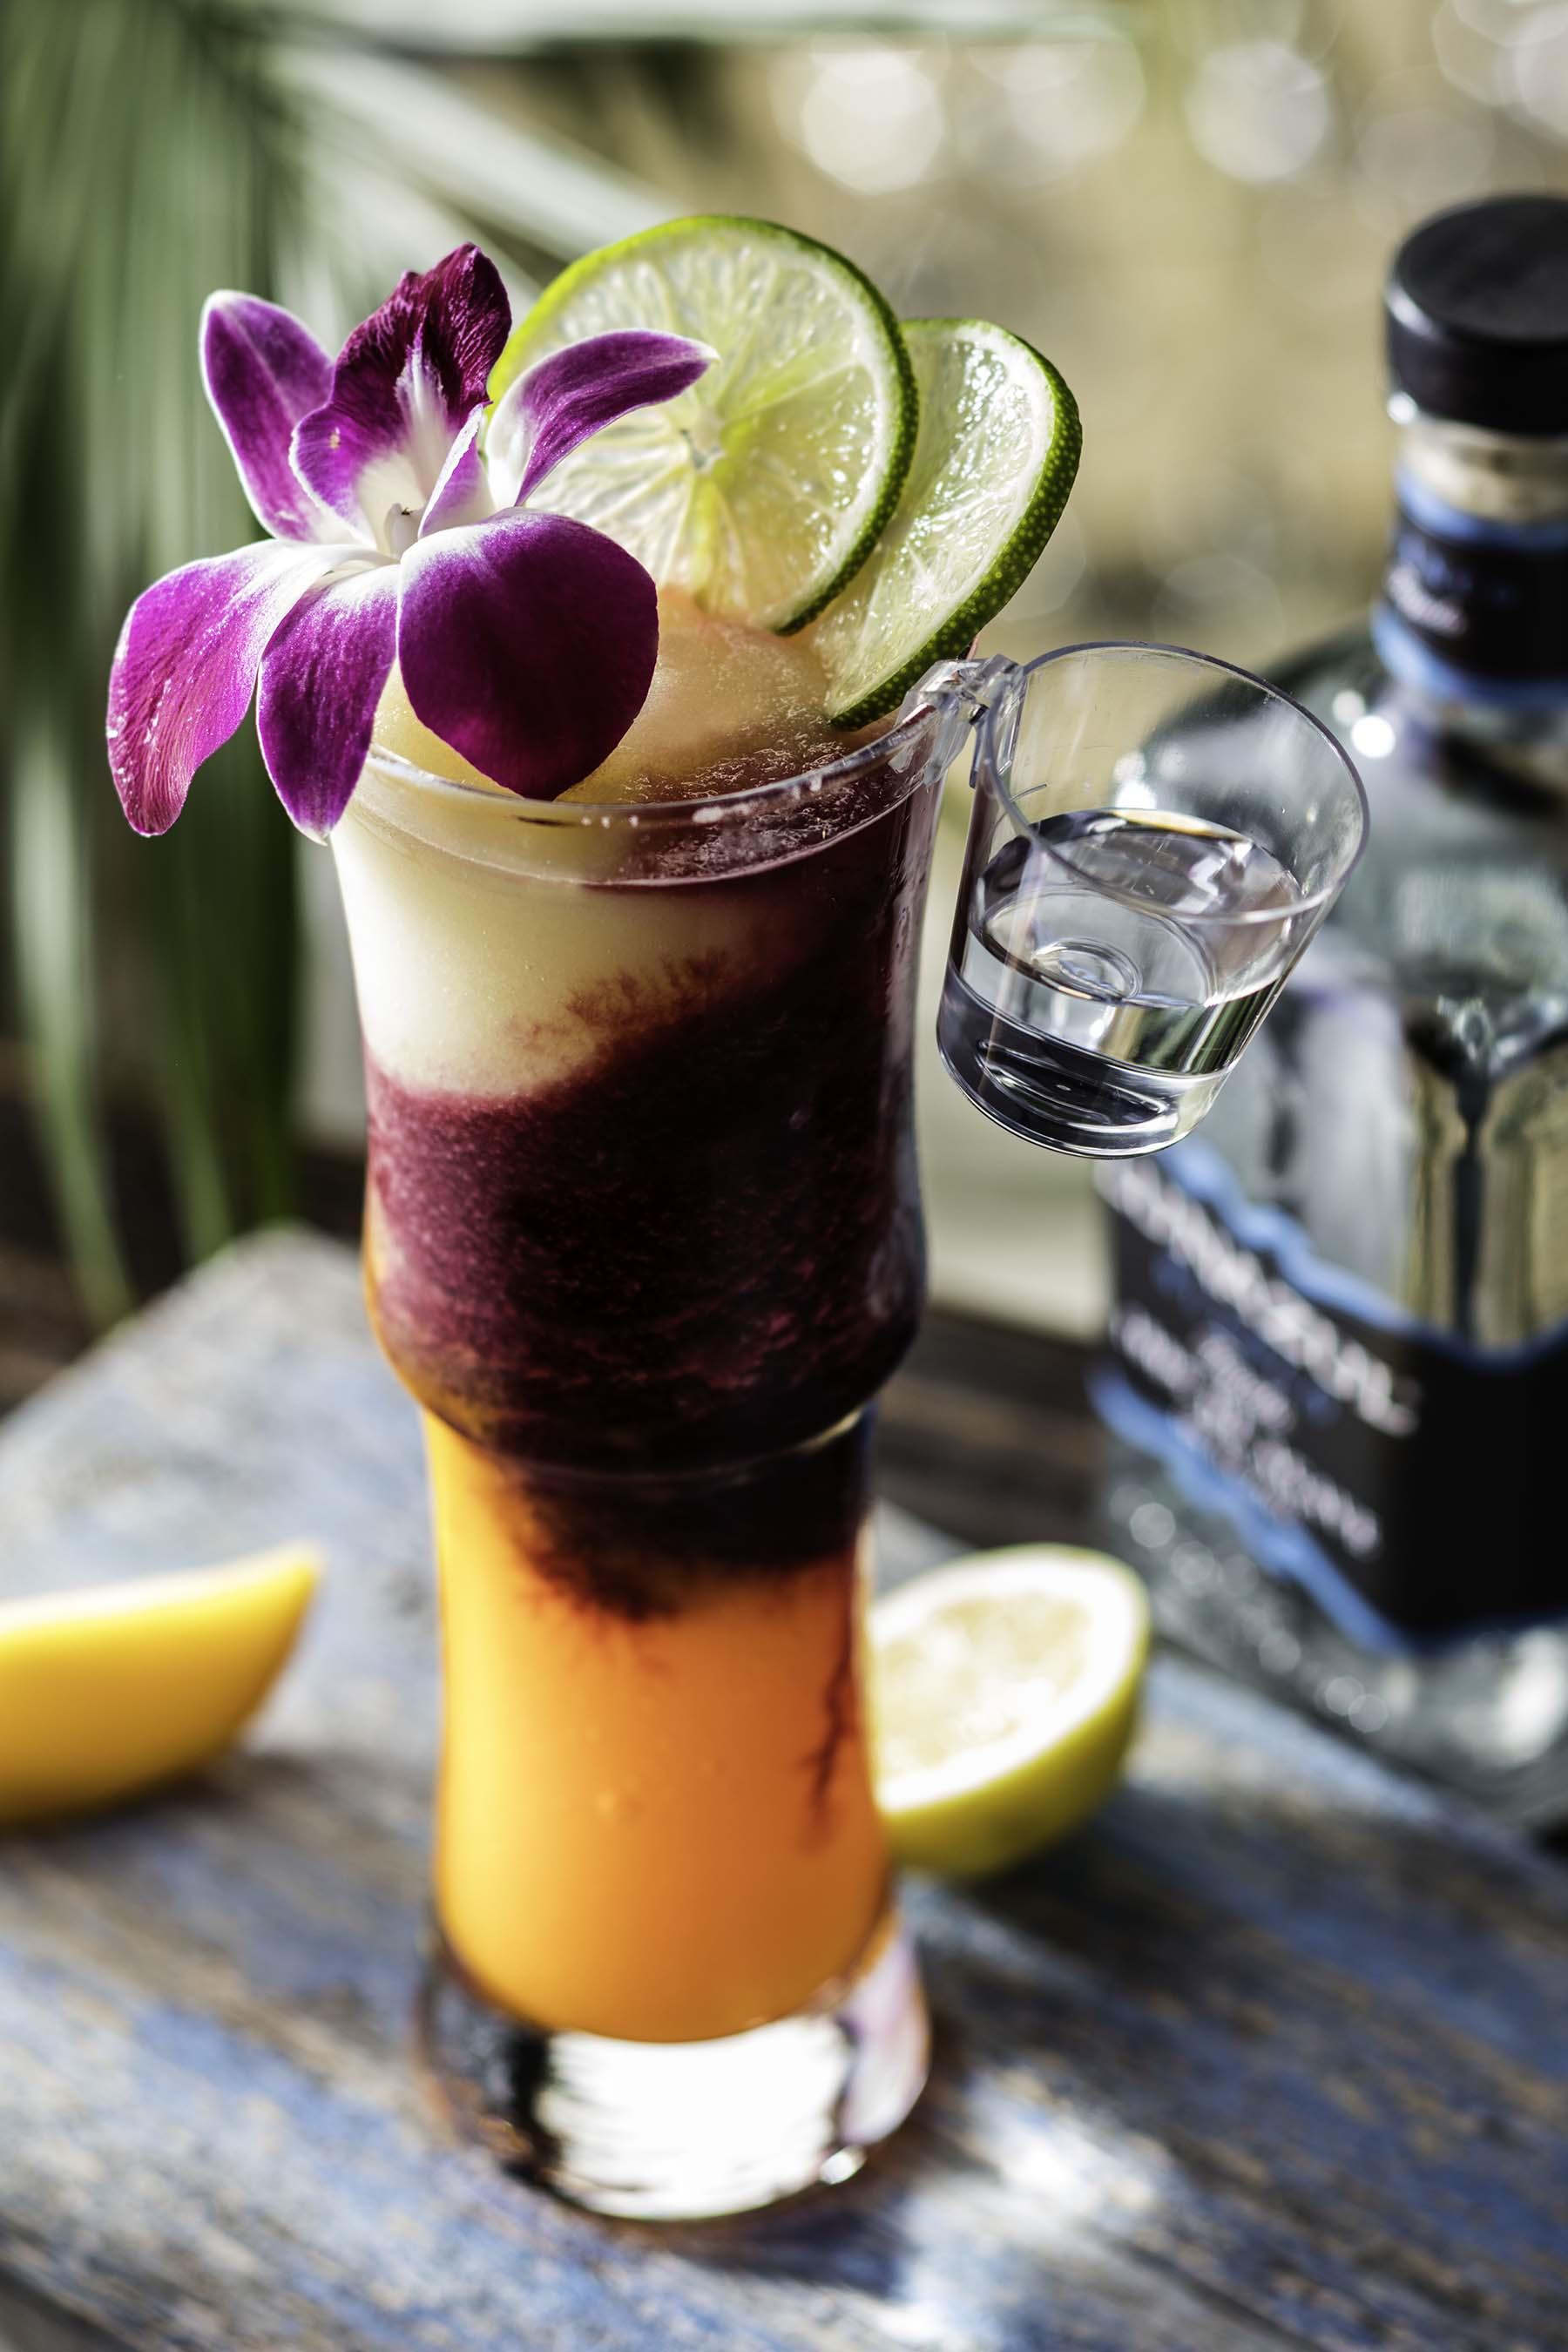 The restaurant's new Lava Lava 'Rita – a fresh twist on a frozen margarita, featuring layers of mango, lemon and hibiscus – makes its debut during Viva la 'Rita.